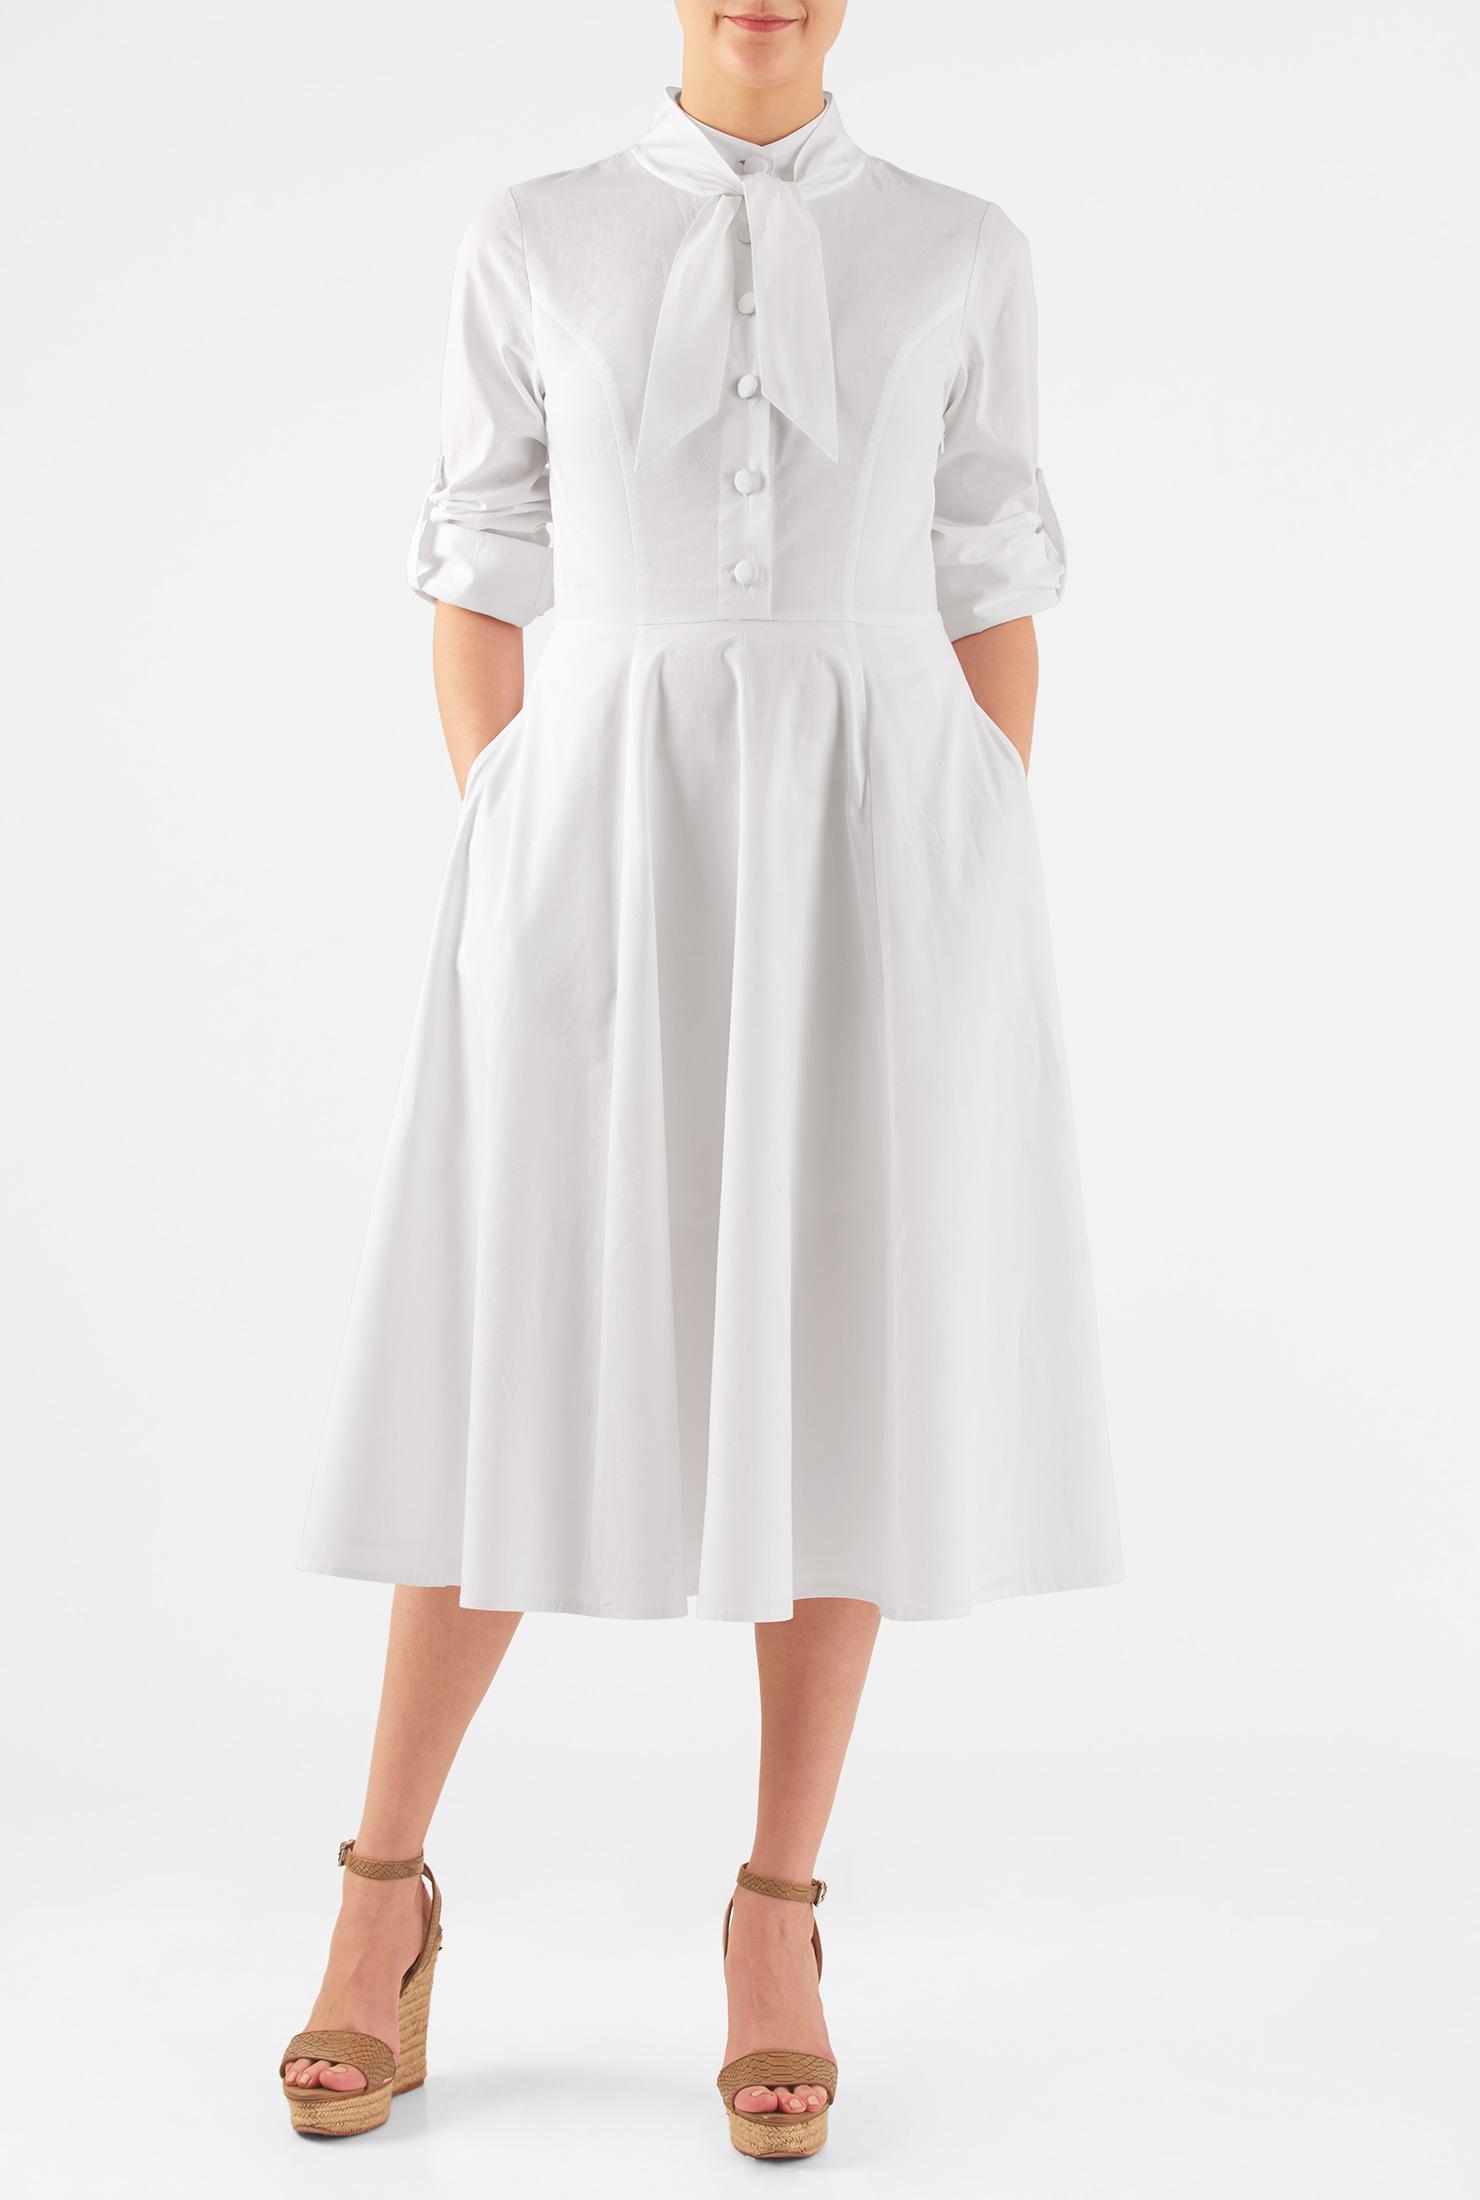 1930s Style Fashion Dresses eShakti Womens Tie neck cotton poplin dress $62.95 AT vintagedancer.com